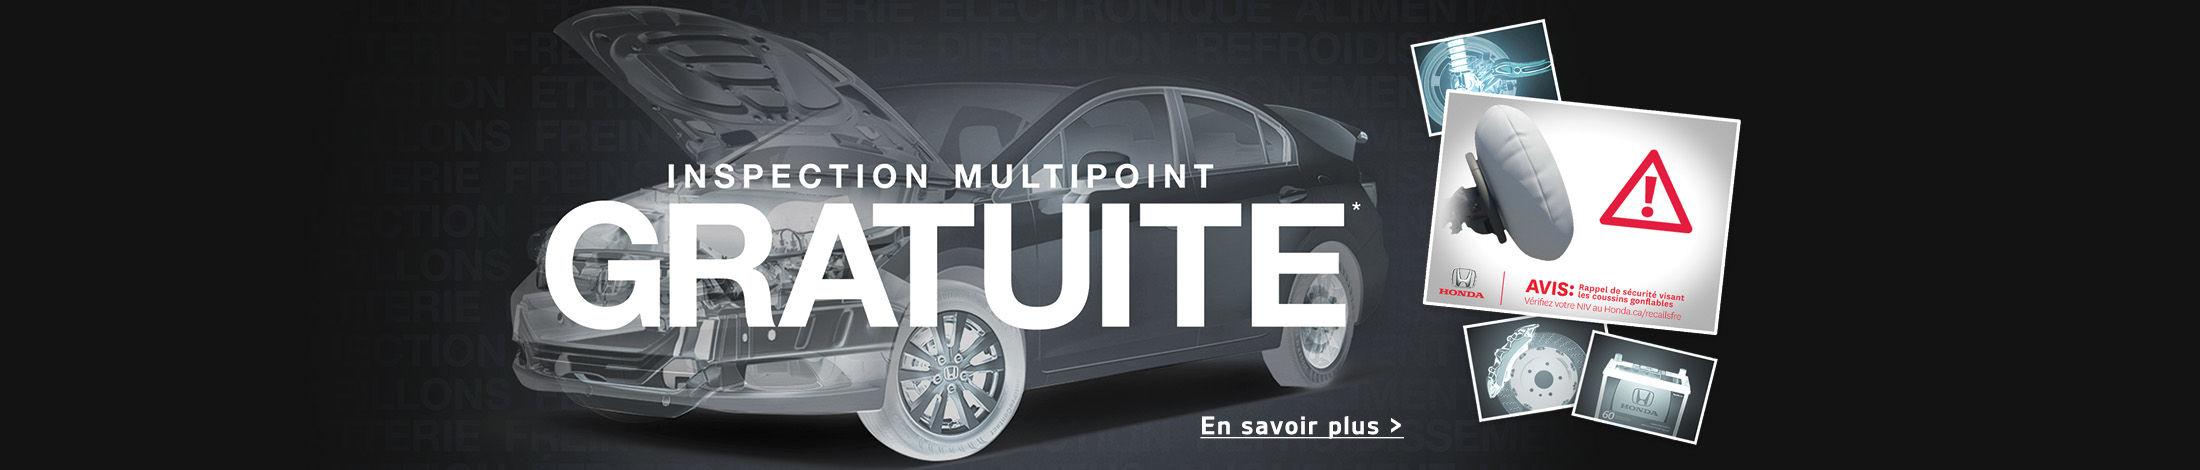 Header Multipoint